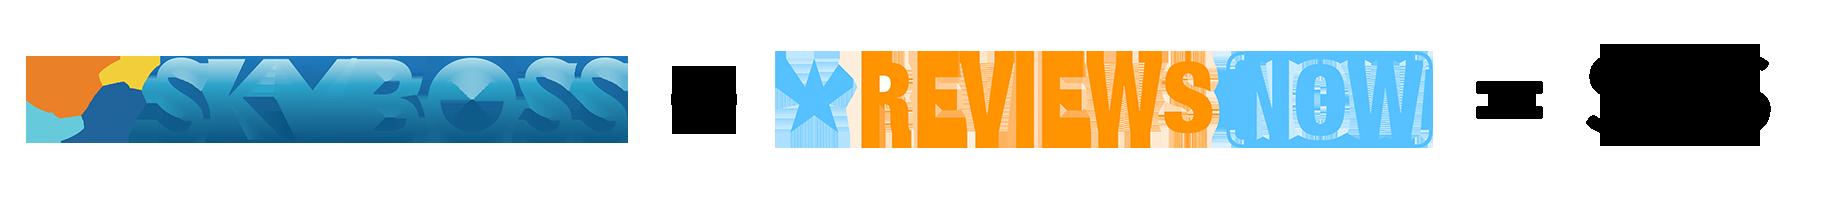 skyboss-and-reviewsnow